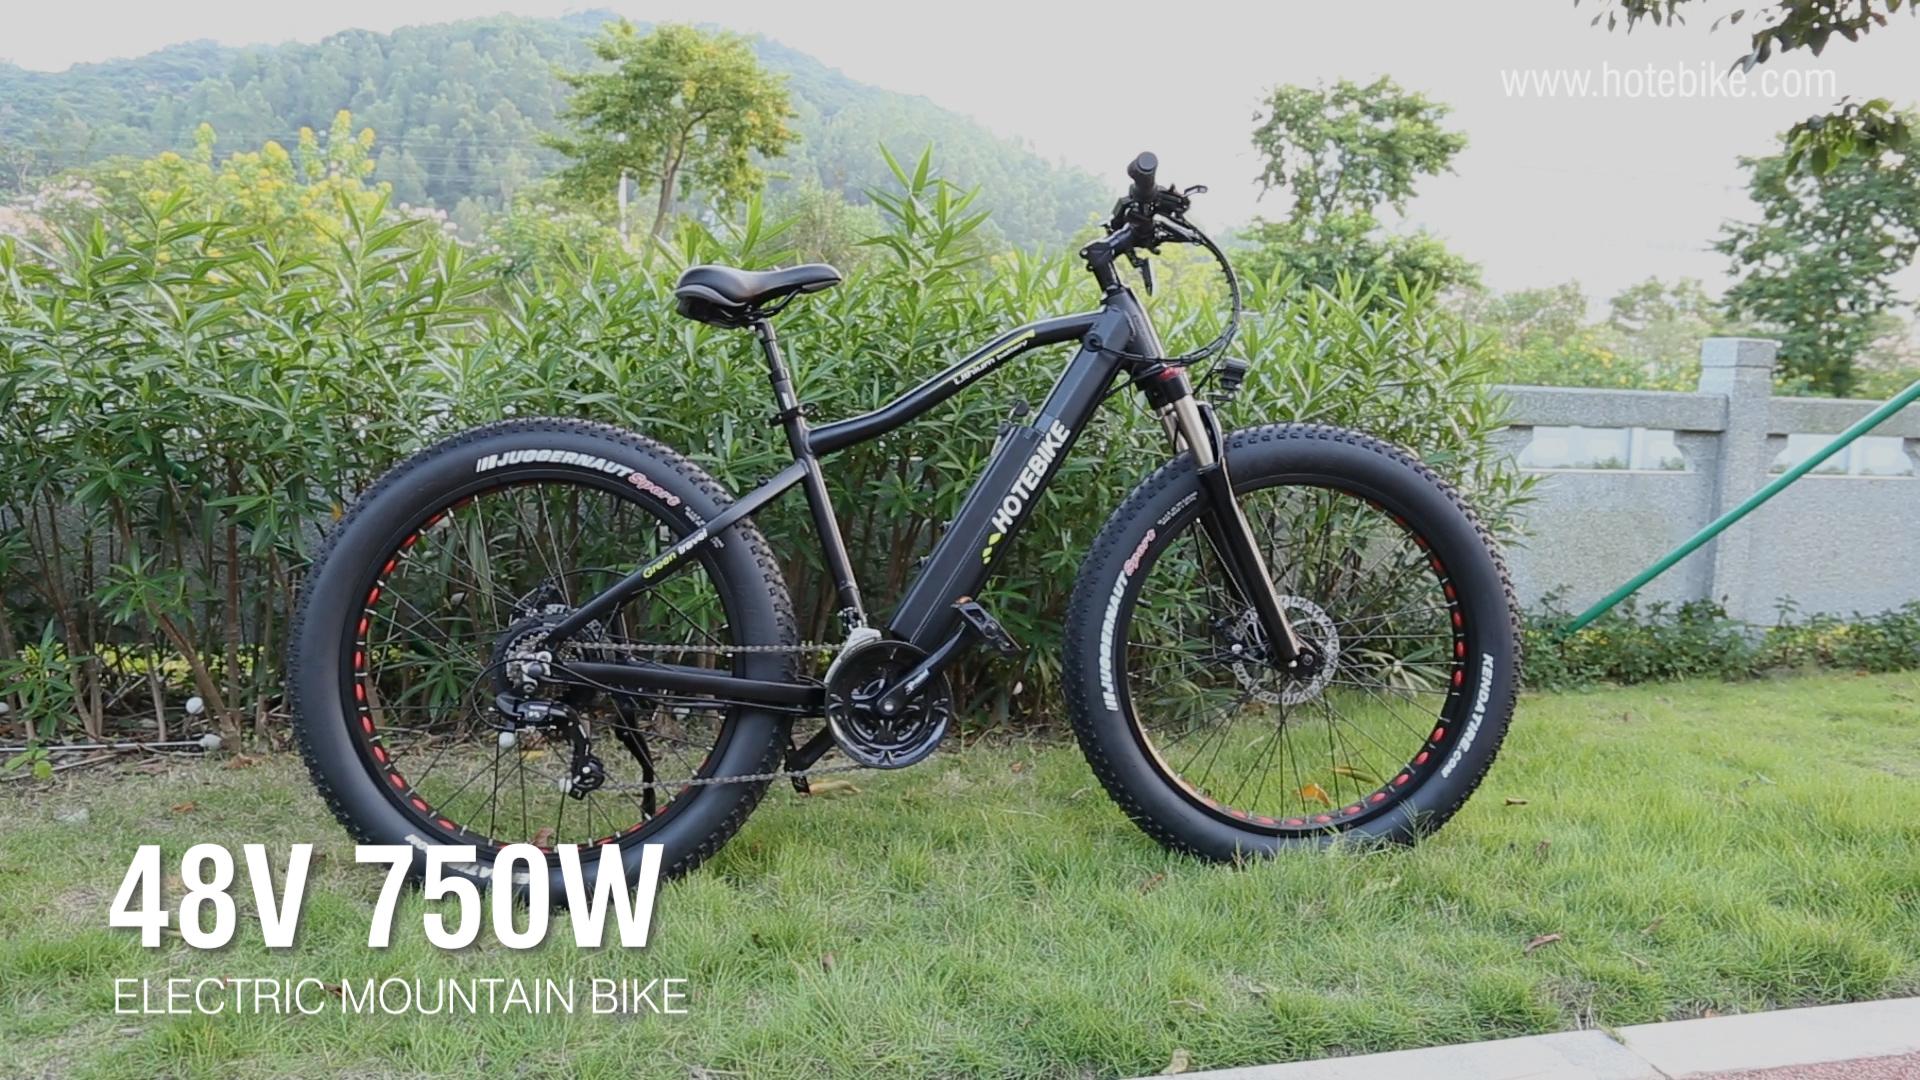 48V 750W Fat Tire Electric Bike Powerful Mountain Bike A6AH26F